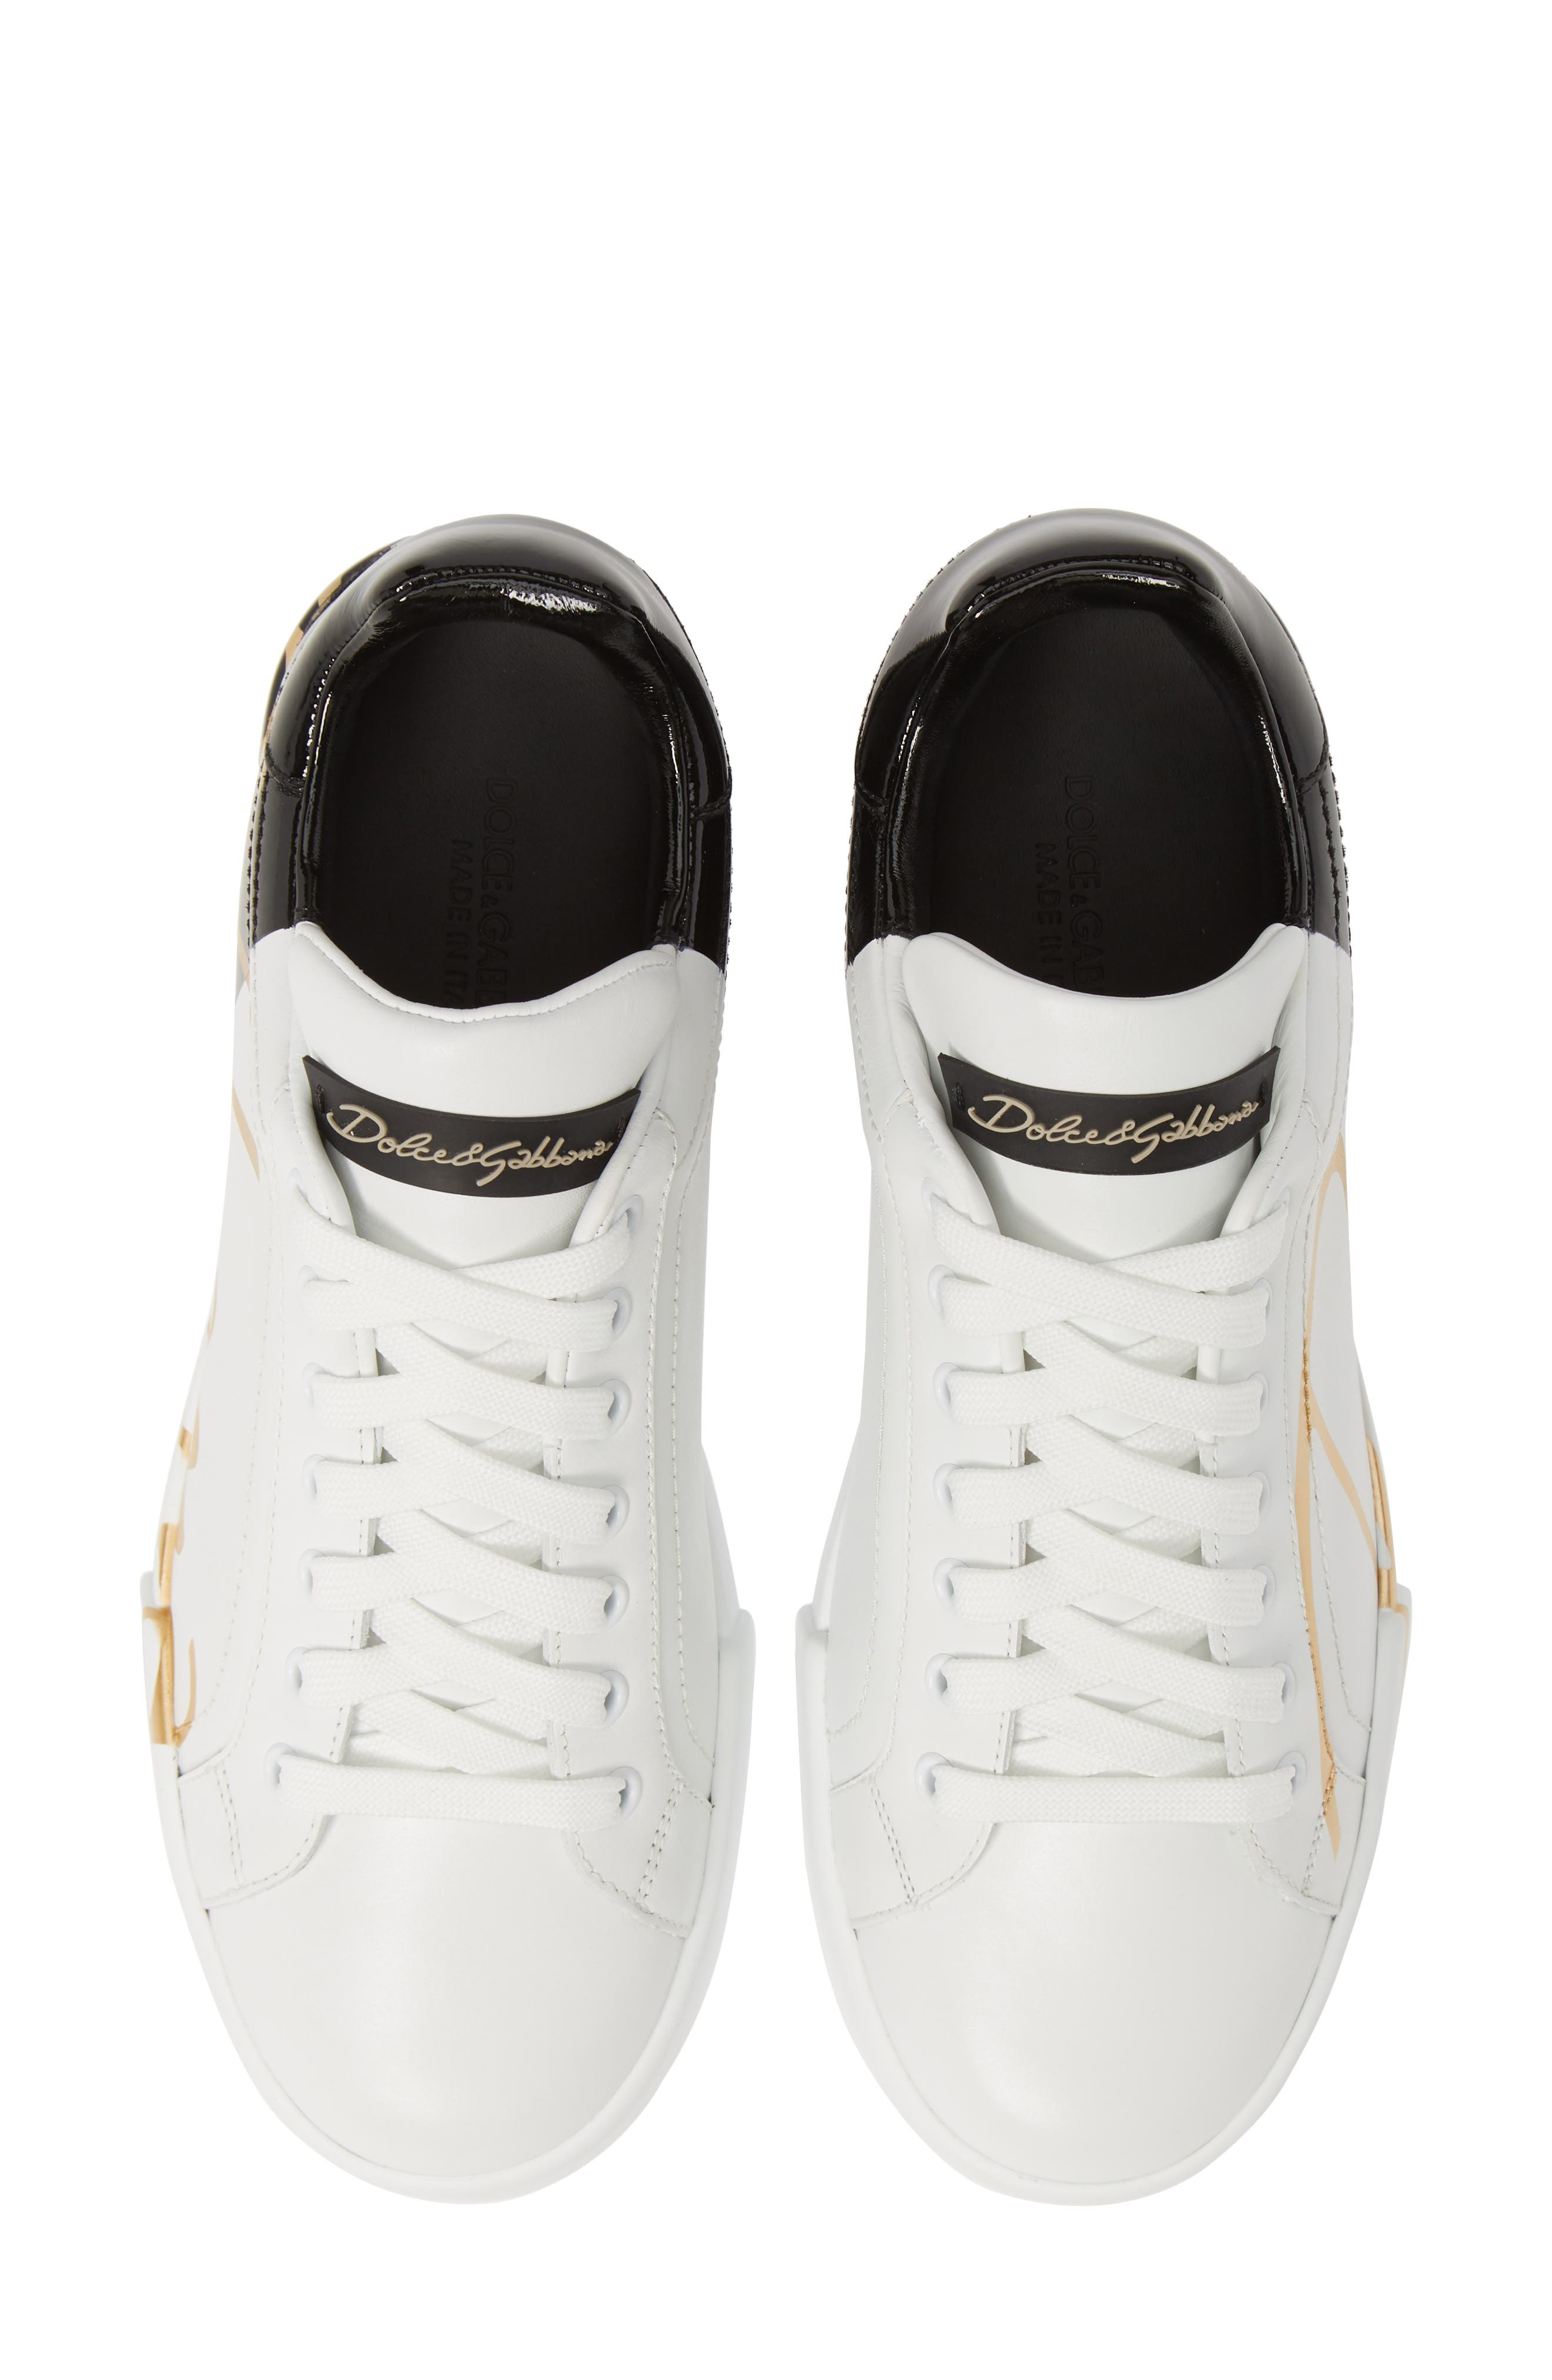 Dolce & gabbana Script Logo Sneaker - White